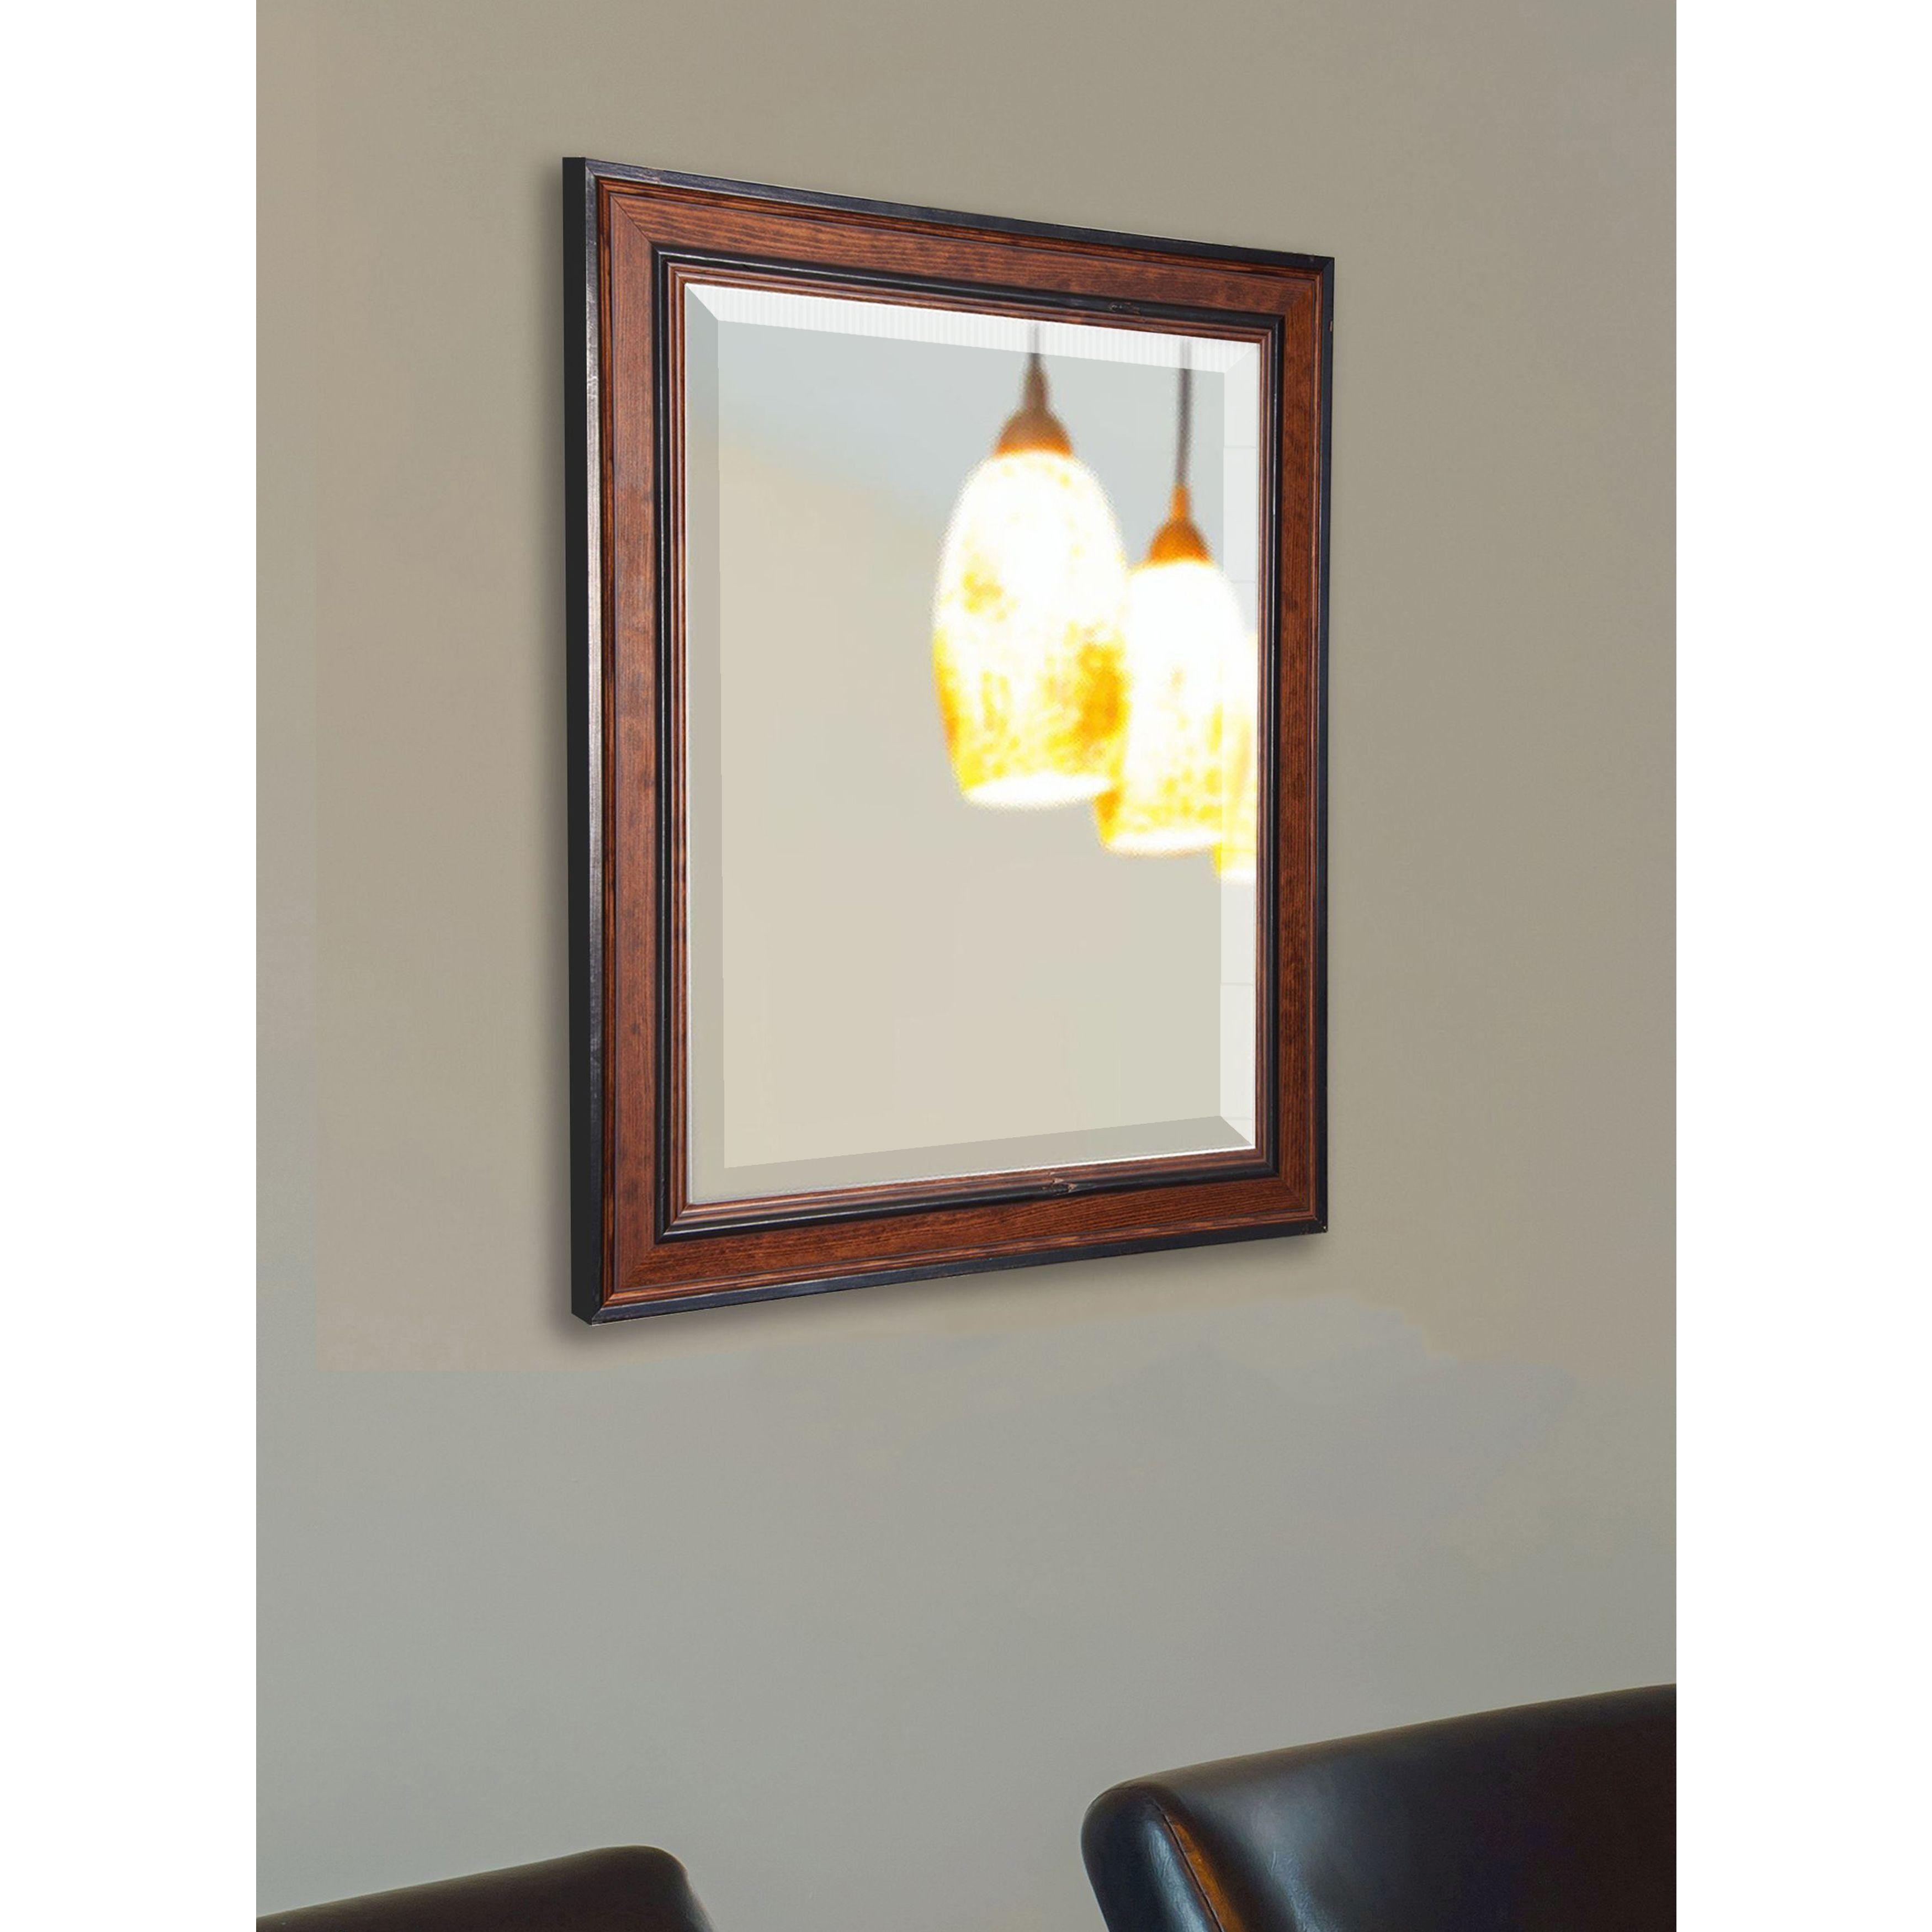 American Made Rayne Rustic Modern Pine Wall/ Vanity Mirror (31.5 X 35.5),  Black